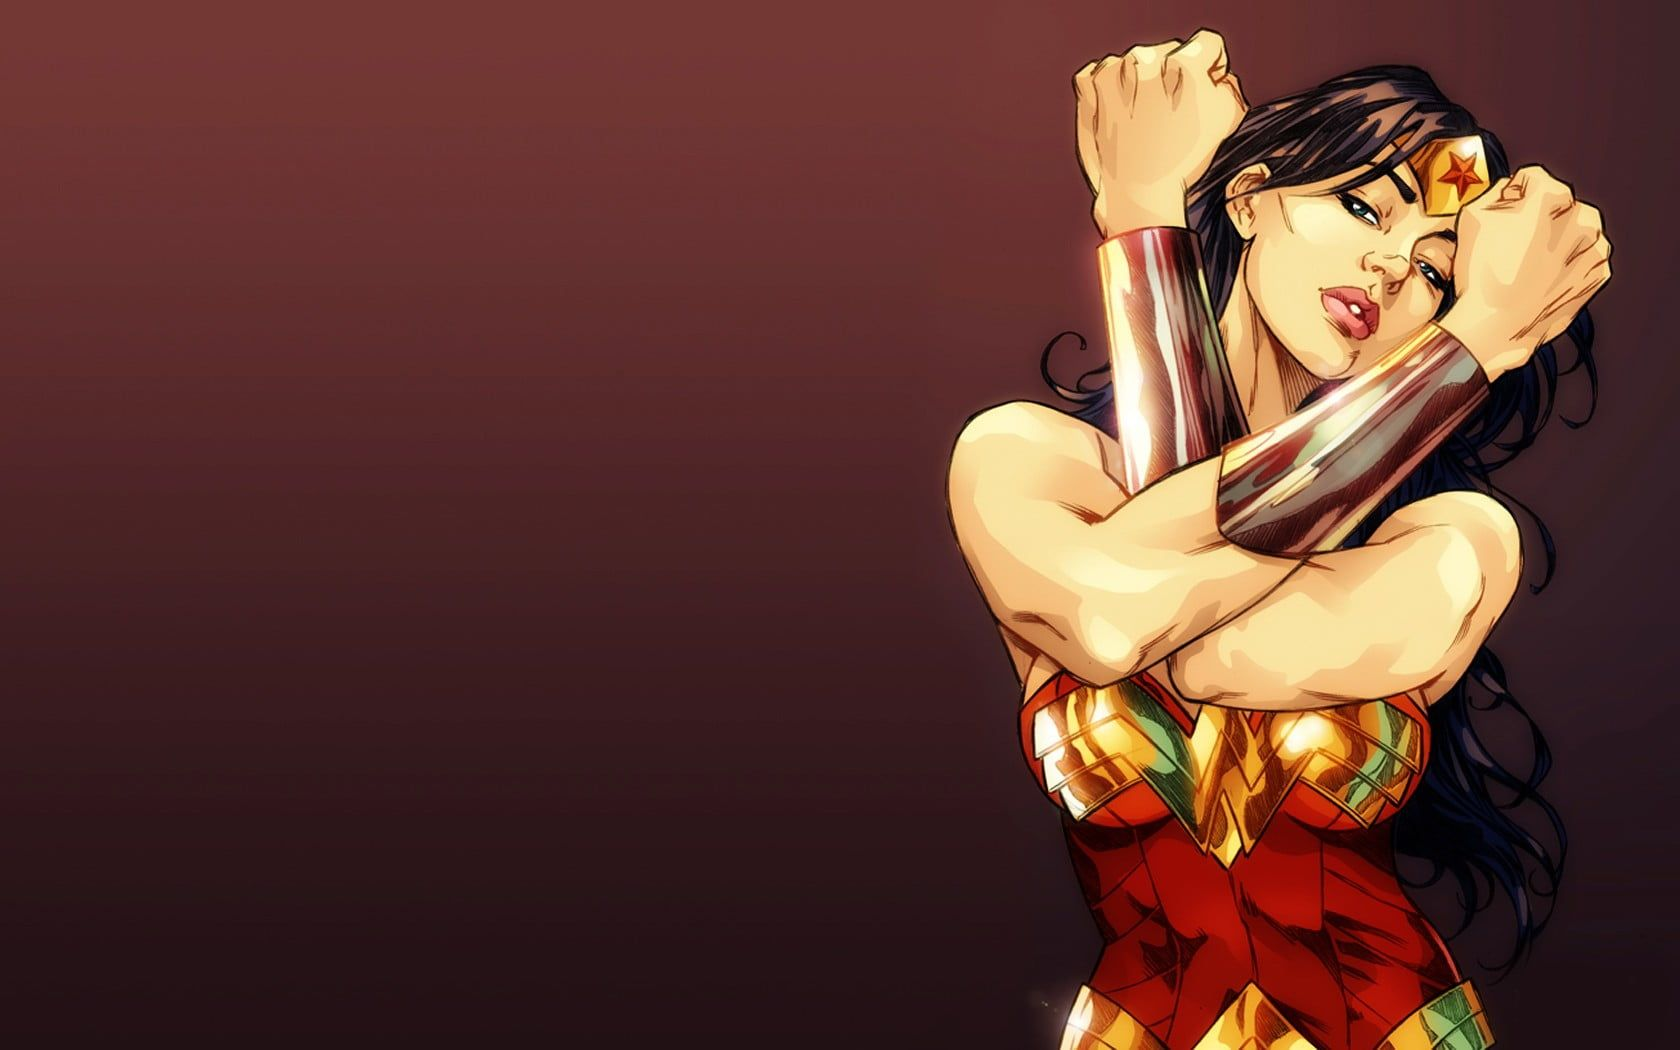 Wonder Woman Wallpaper Wonder Woman Superheroines 720p Wallpaper Hdwallpaper Desktop Wonder Woman Pictures Wonder Woman Artwork Wonder Woman Movie